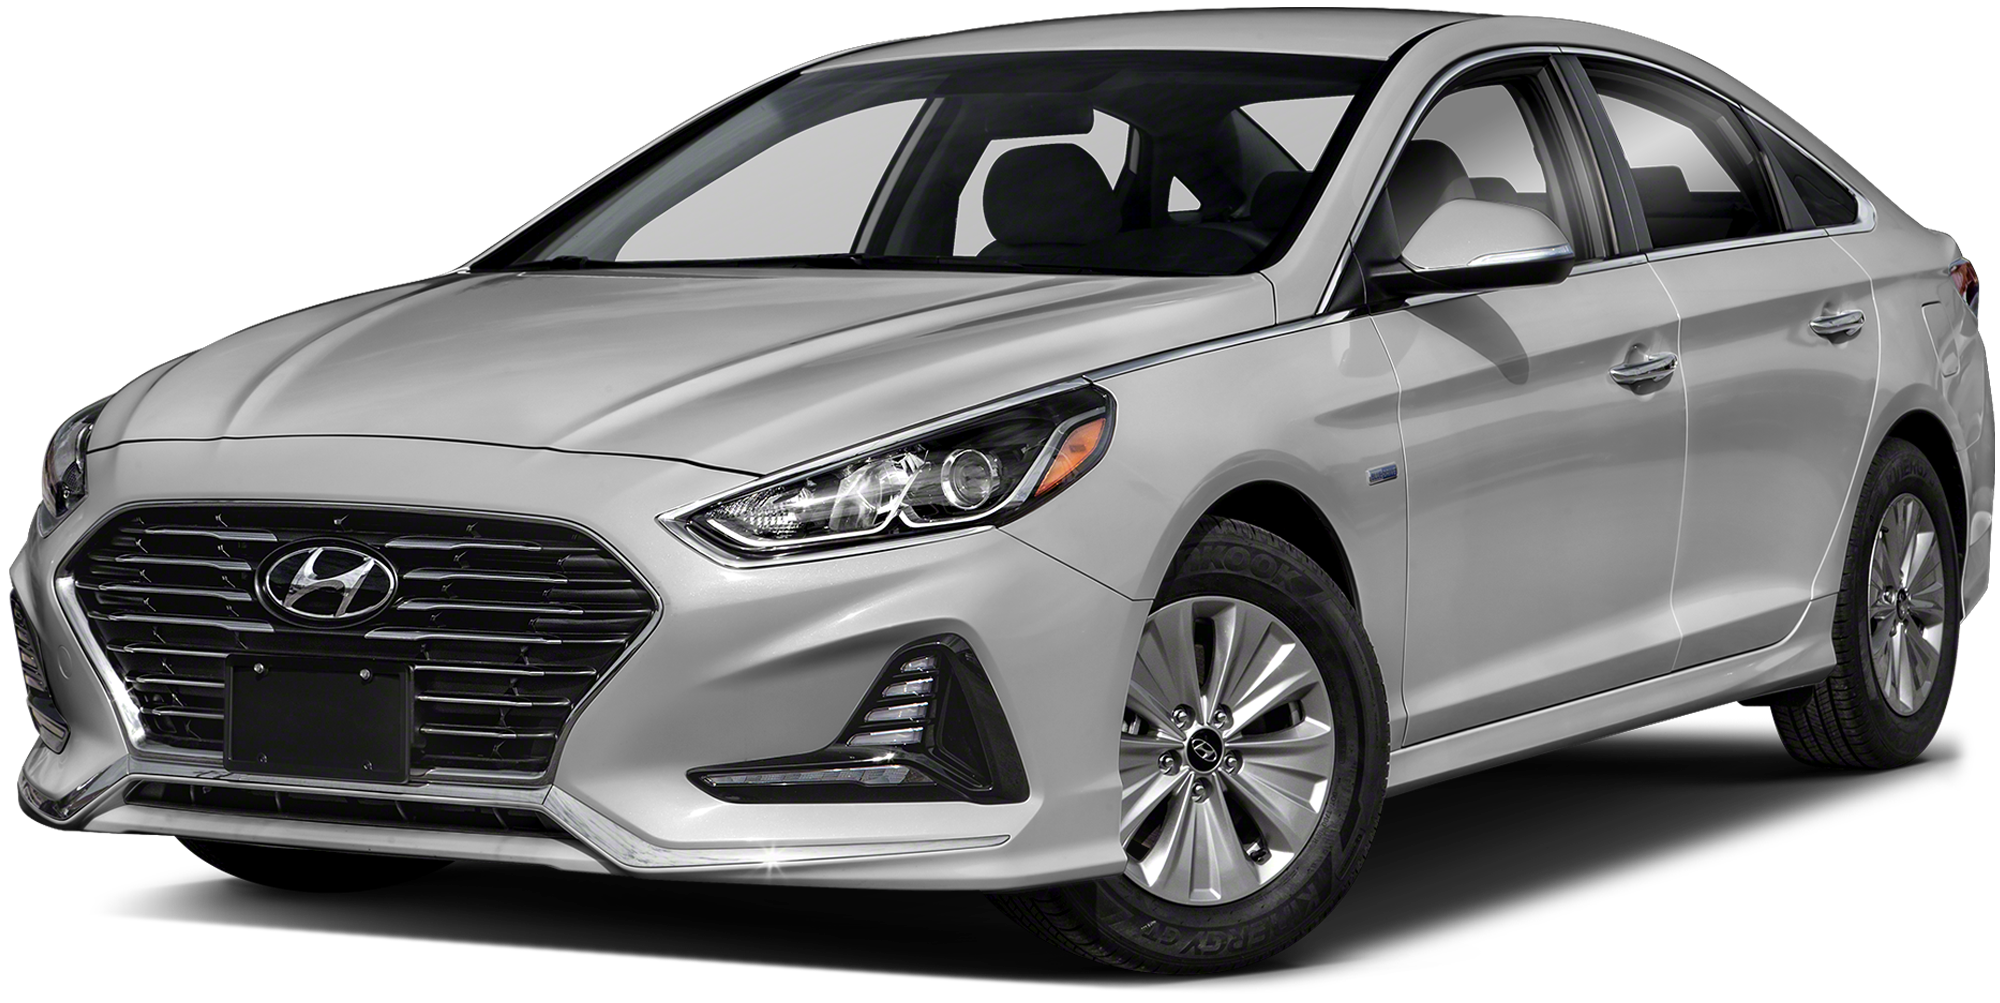 2019 Hyundai Sonata Hybrid Incentives, Specials & Offers ...